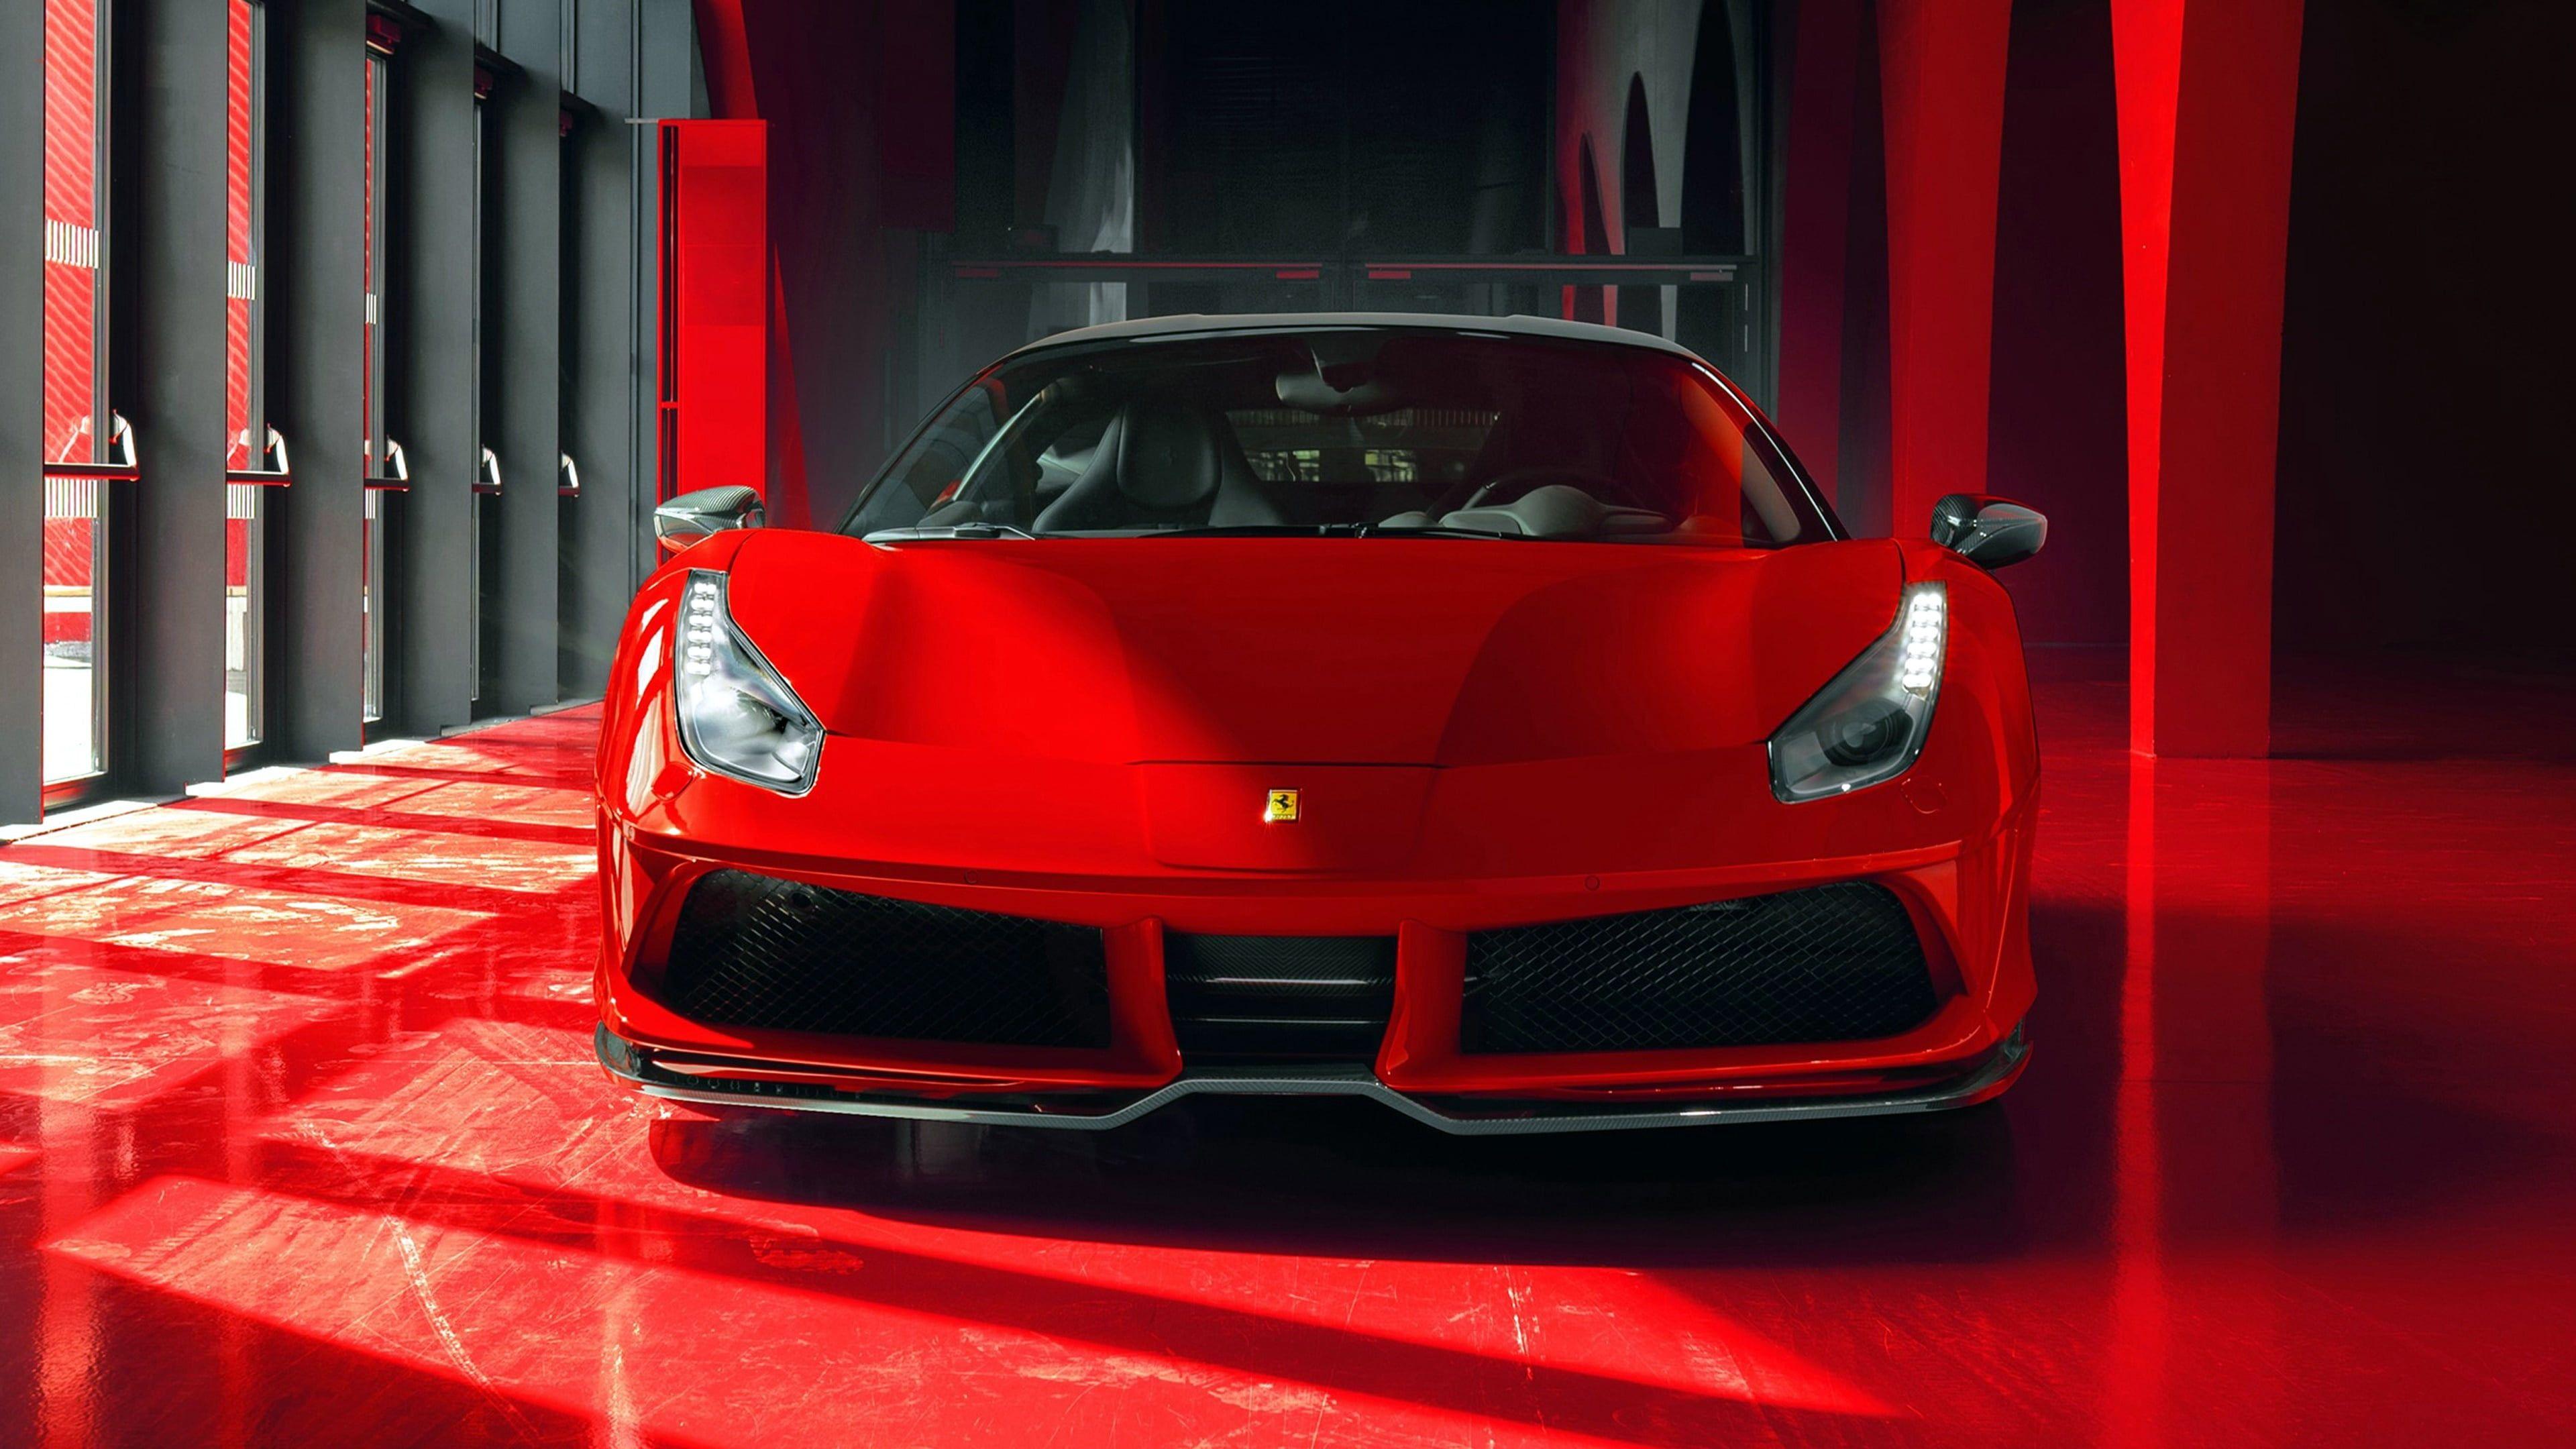 Red Car Car Ferrari 488 Gtb Ferrari Vehicle Luxury Vehicle Sports Car Cool 2018 Supercar 4k Wallpaper Hdwallp In 2020 Ferrari 488 Ferrari Cool Wallpapers Cars